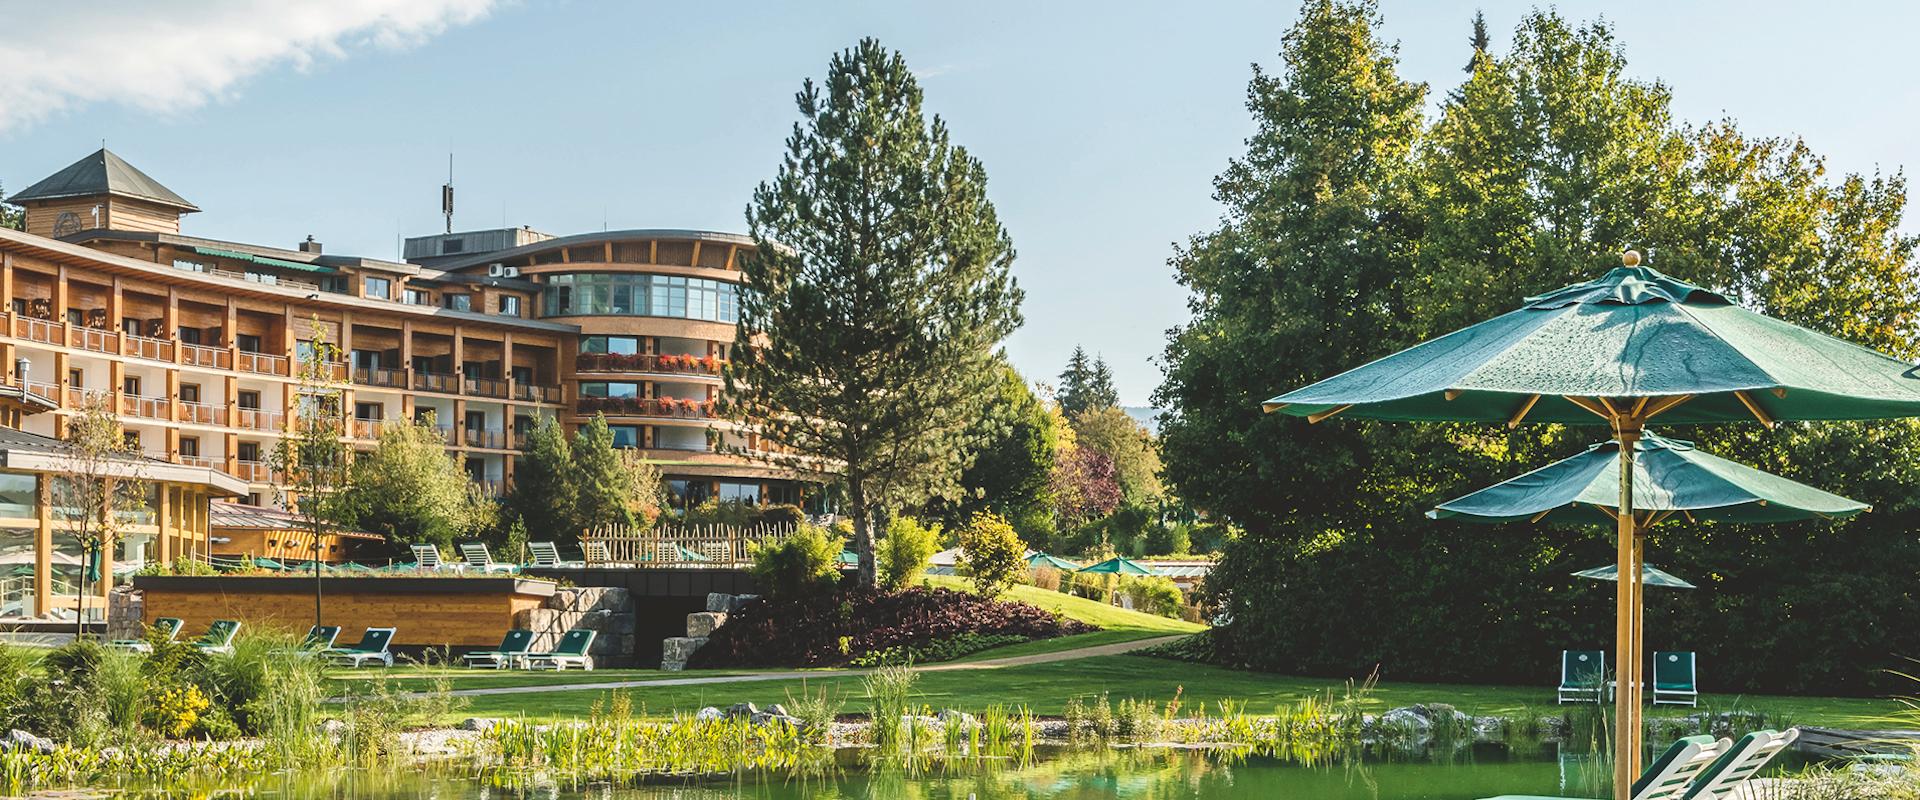 Sonnenalp-Resort_Sonnenalp-Resort